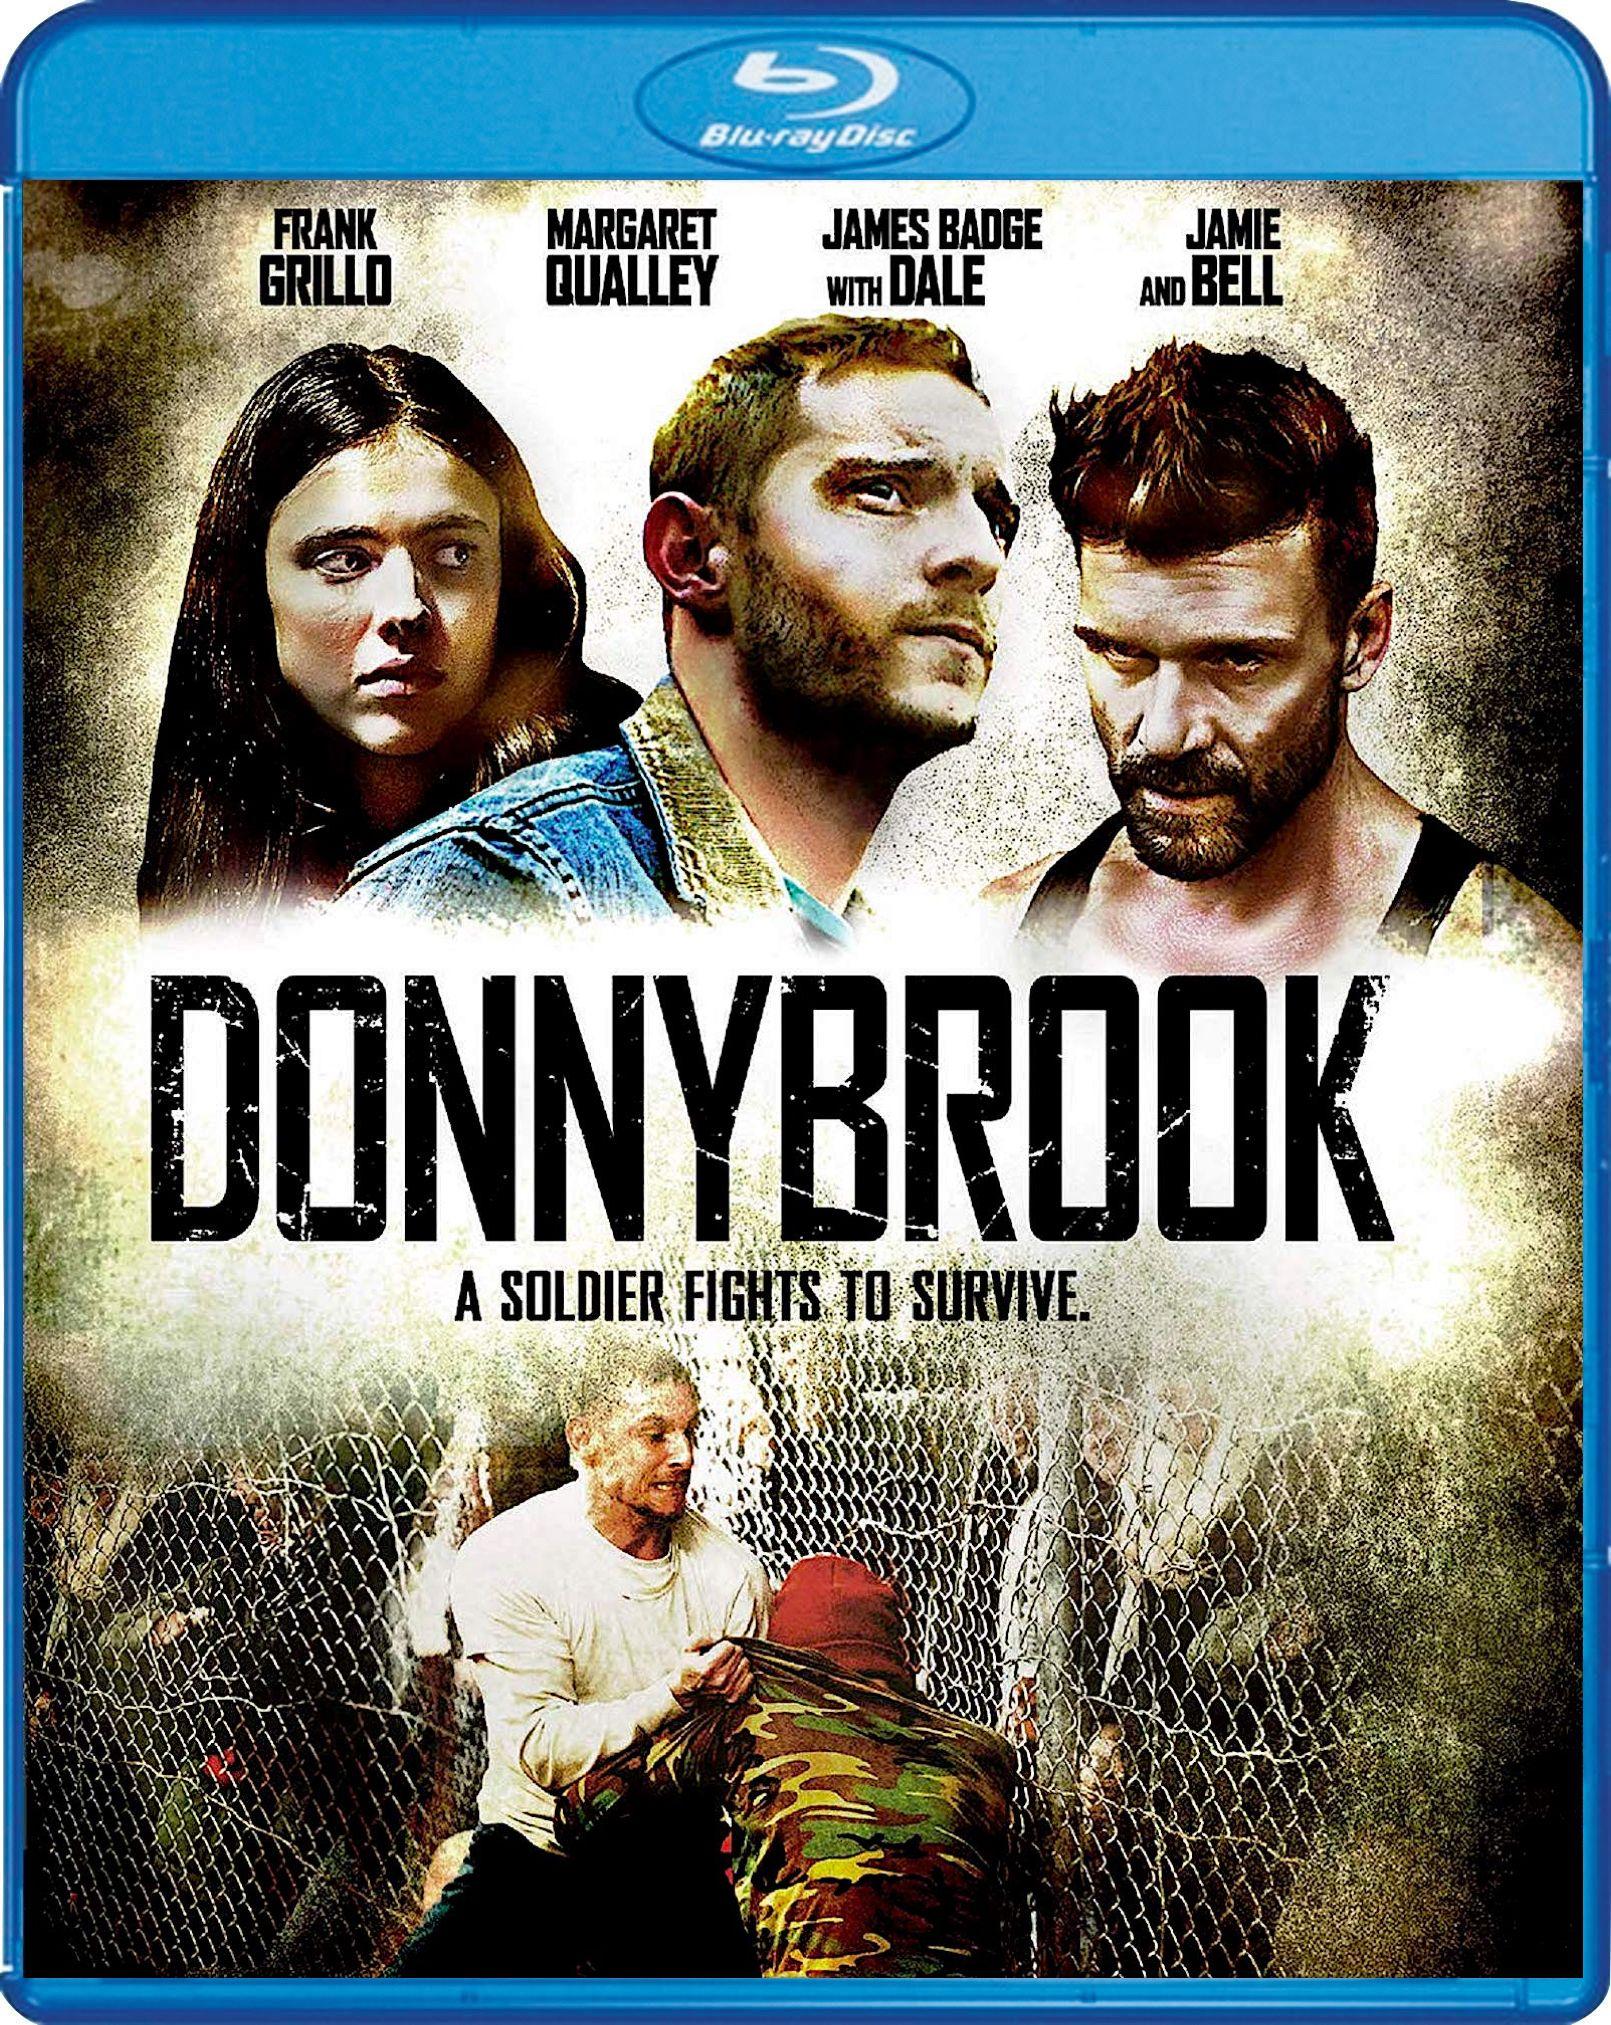 DONNYBROOK BLURAY (SHOUT FACTORY) Blu ray, Donnybrook